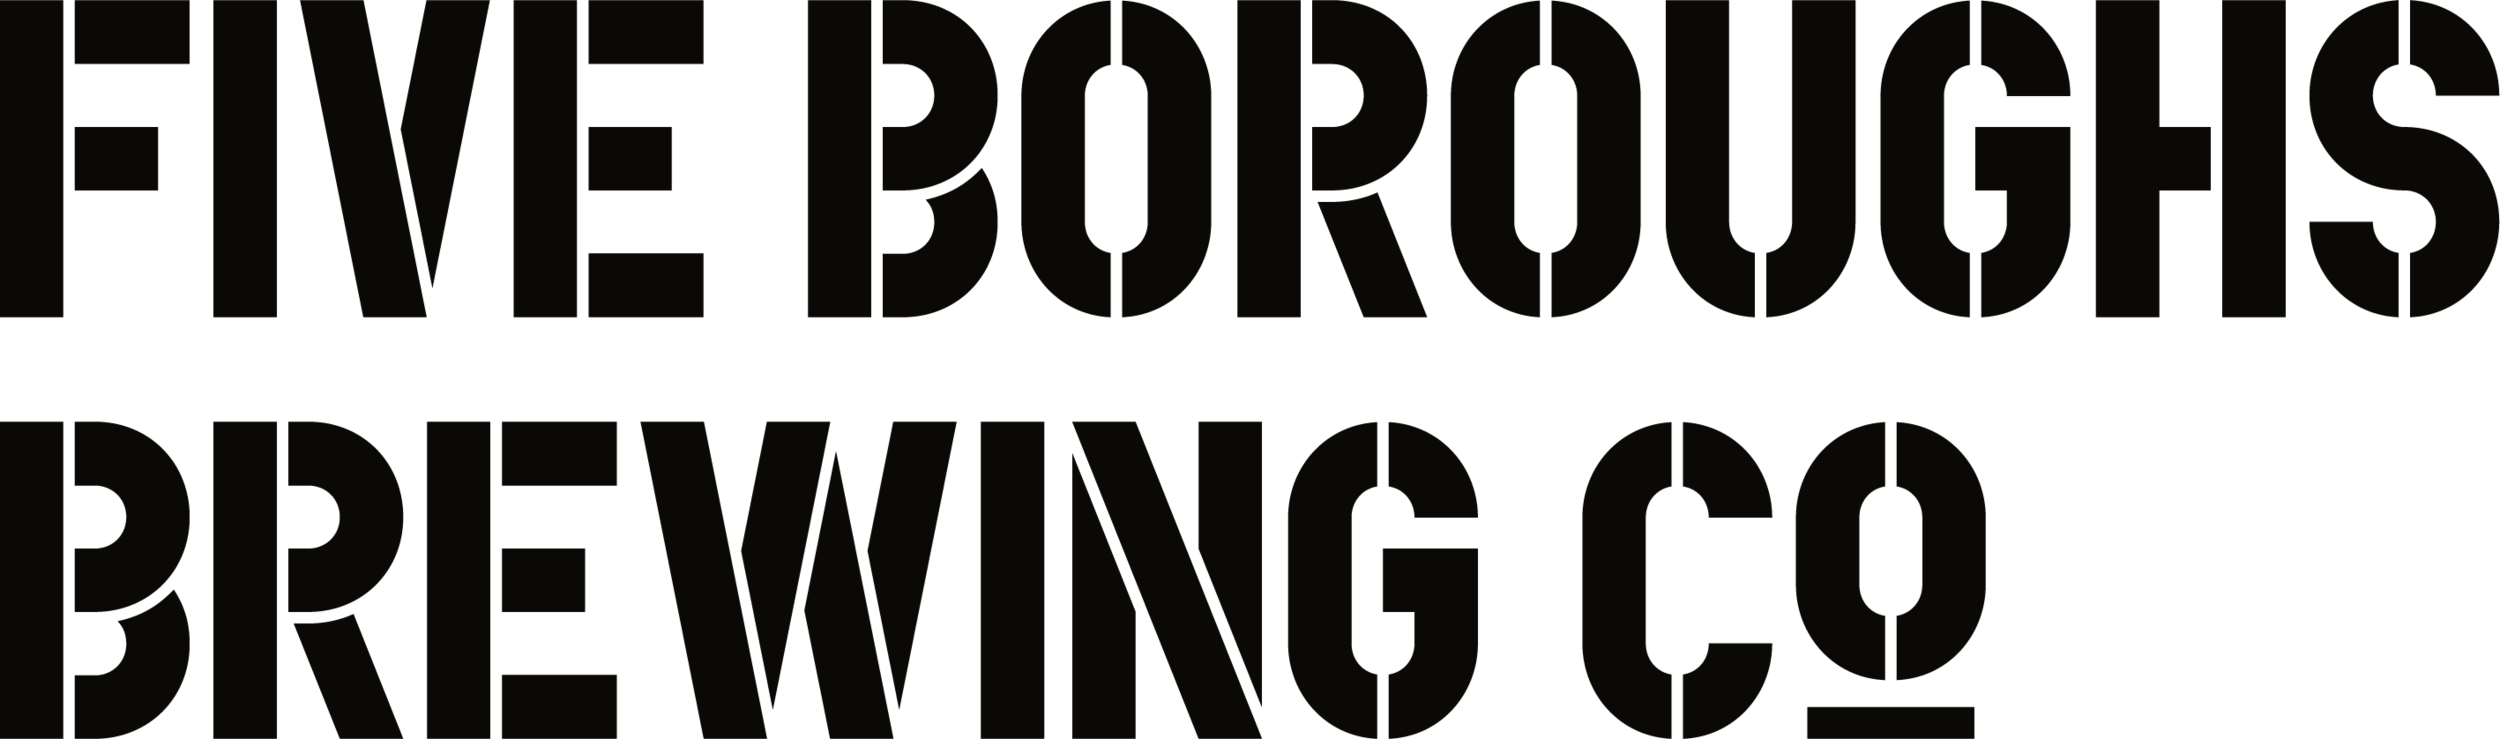 FBBC_BRAND_LOGO.png